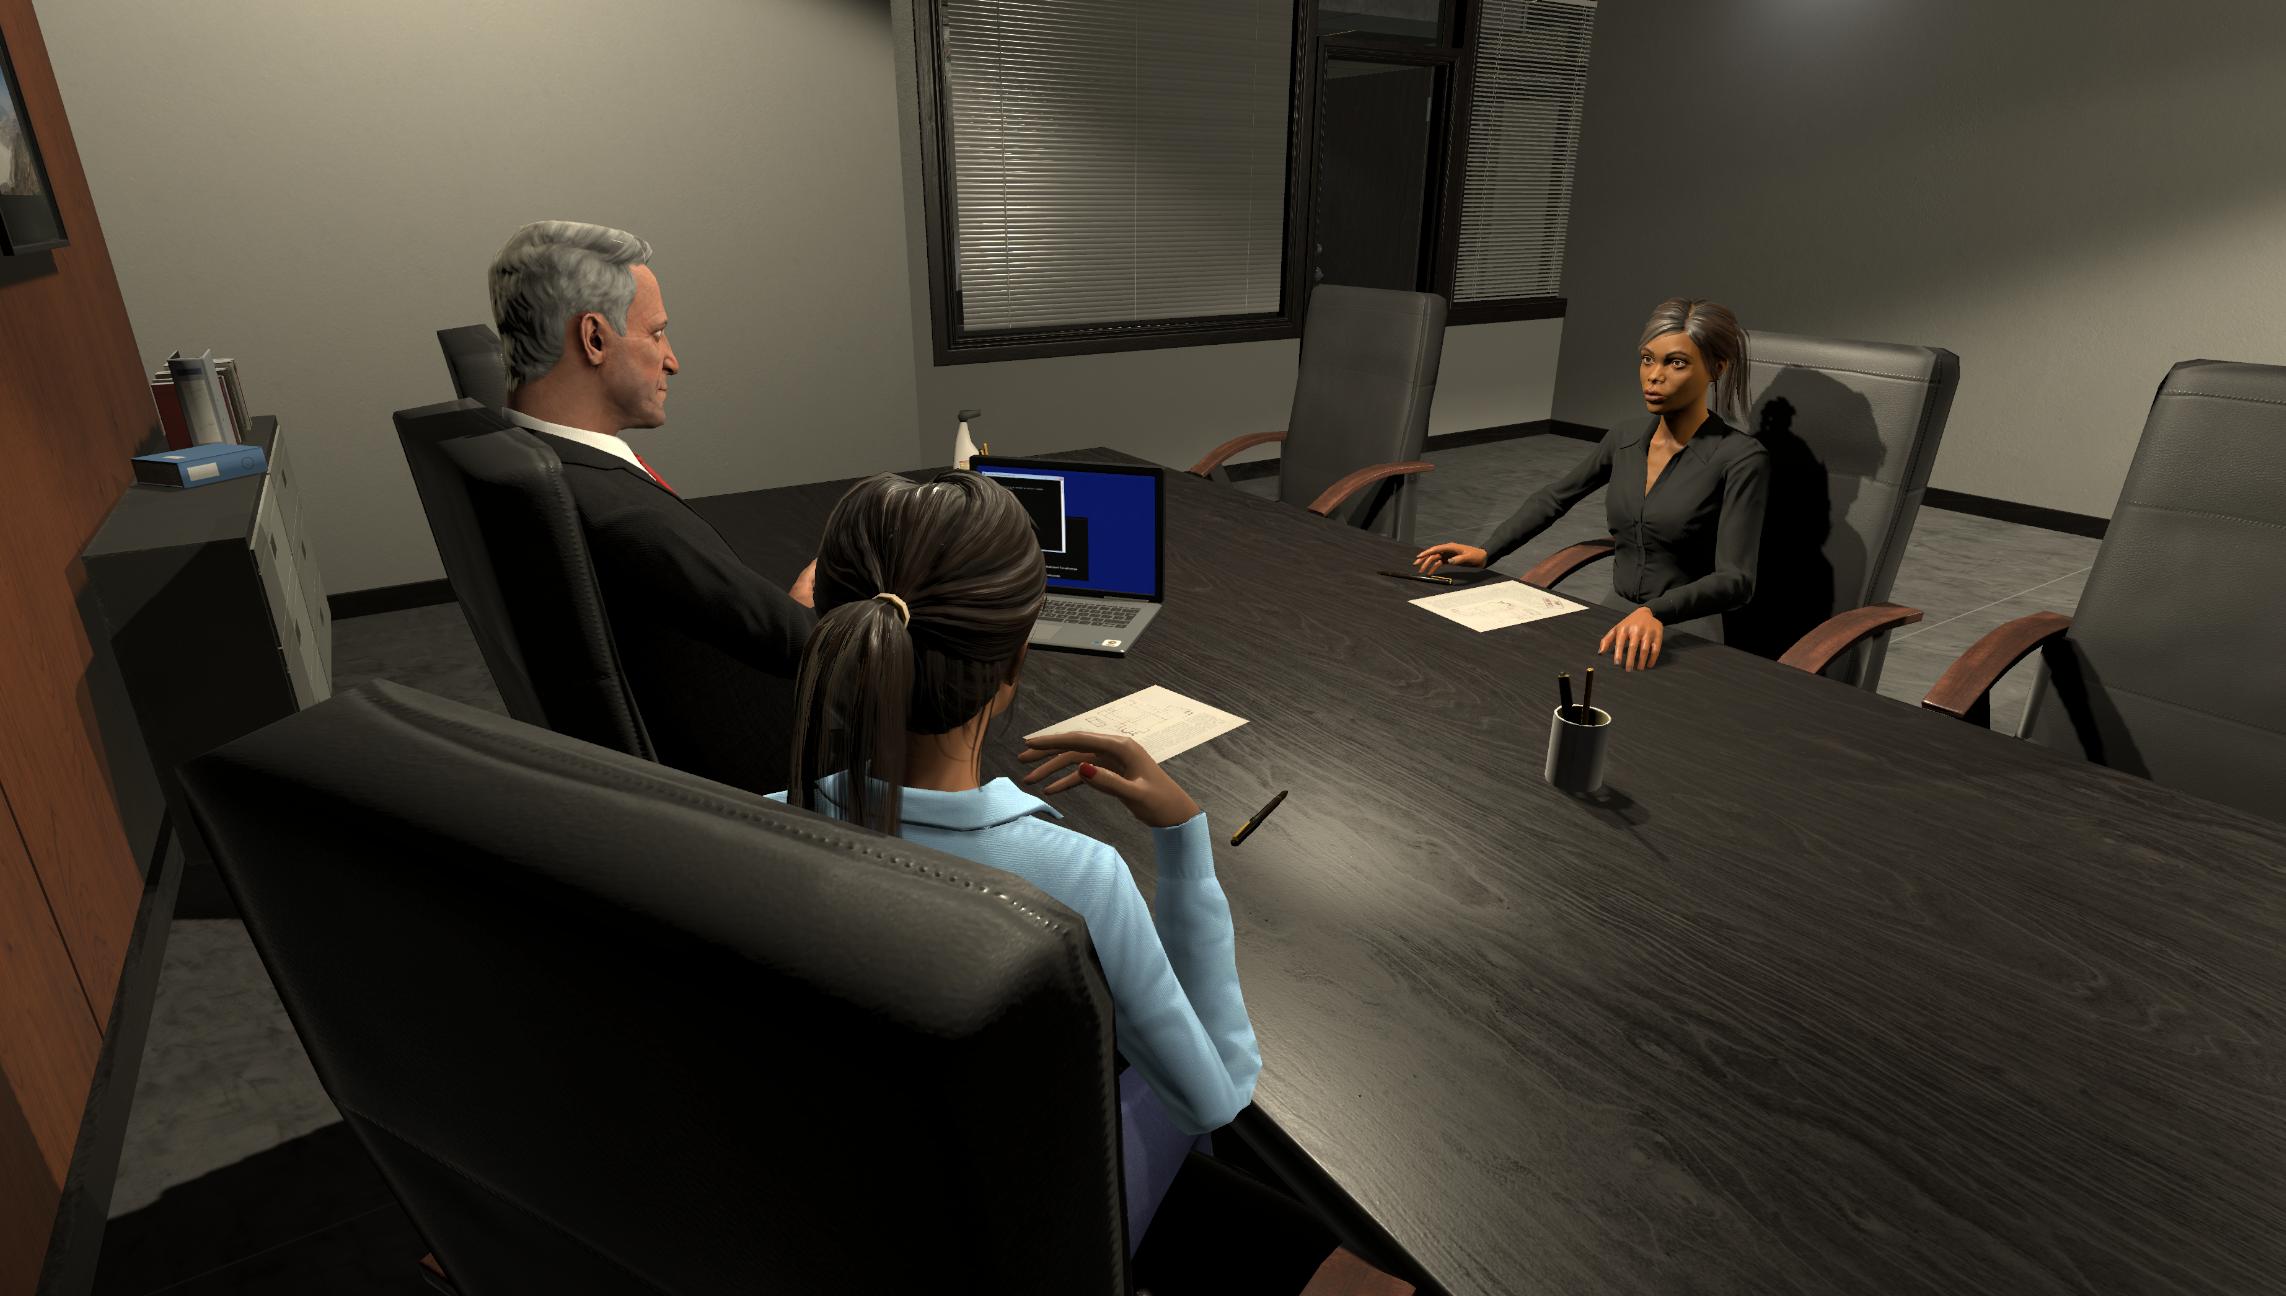 Office_scenario_v3